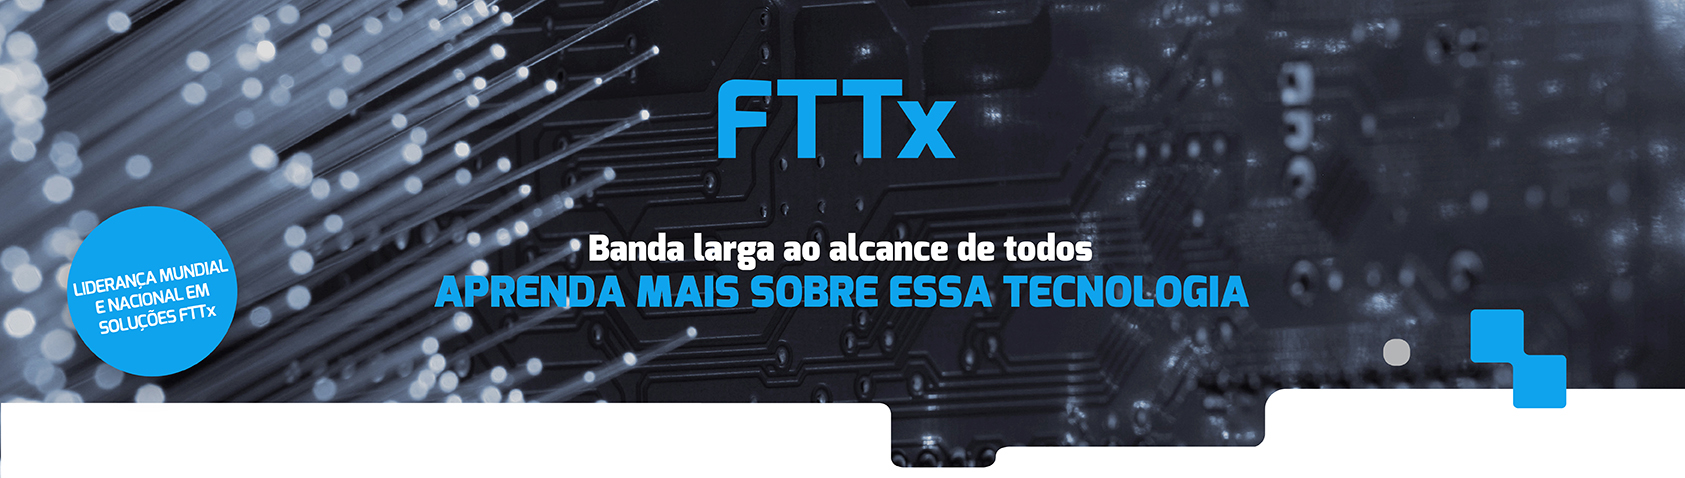 Fttx prancheta%201